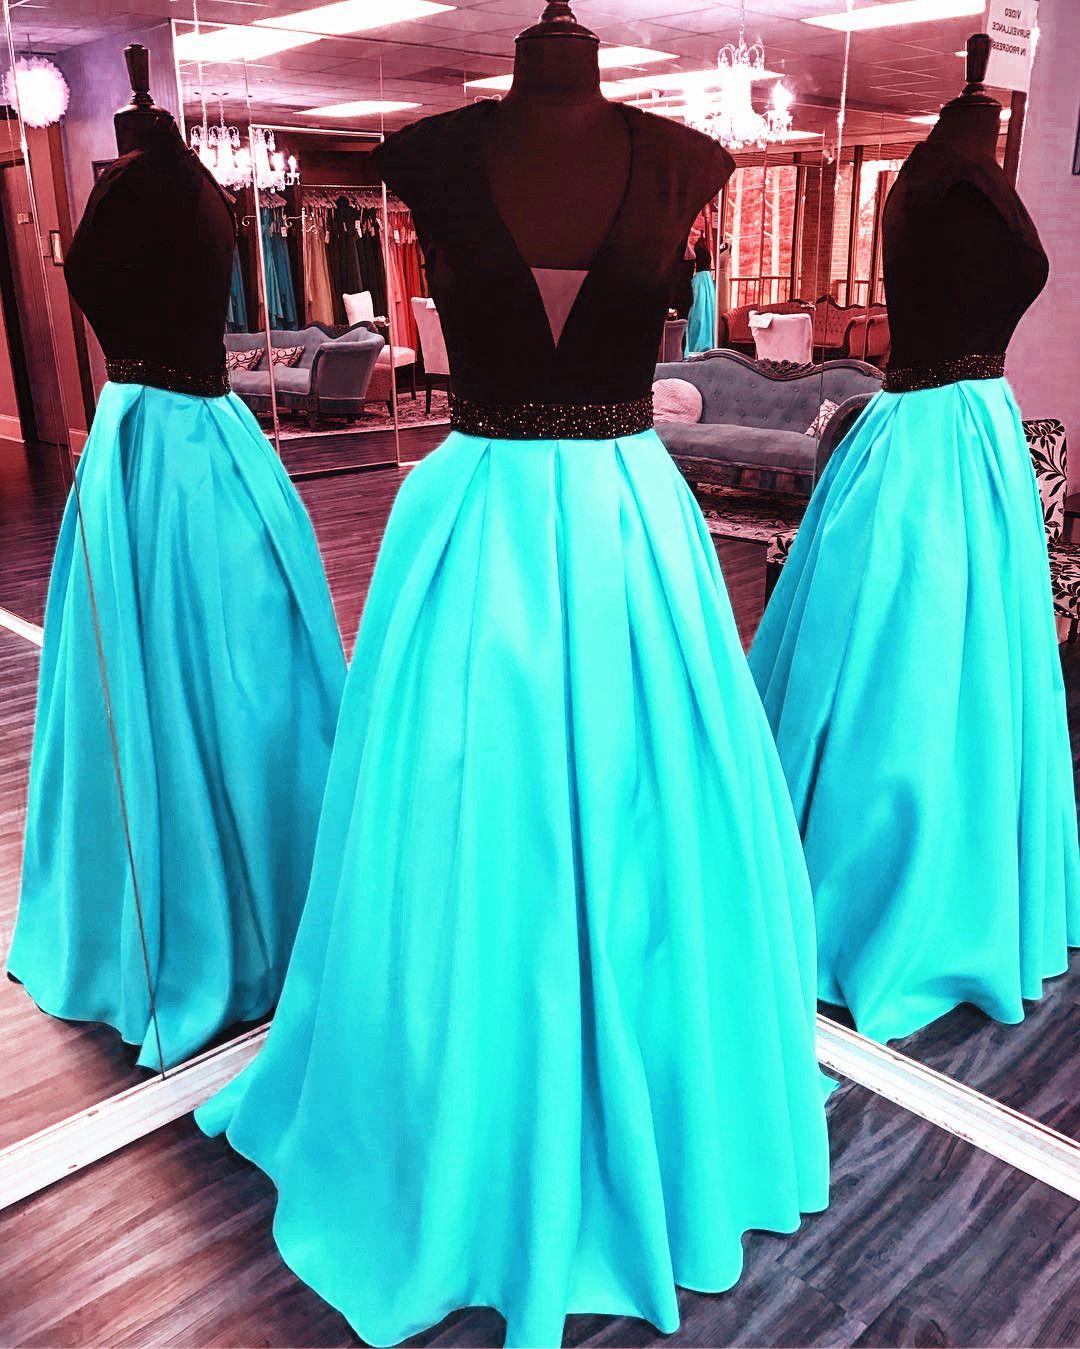 Turquoise prom dresseslong prom gownslong formal dresseswomenus